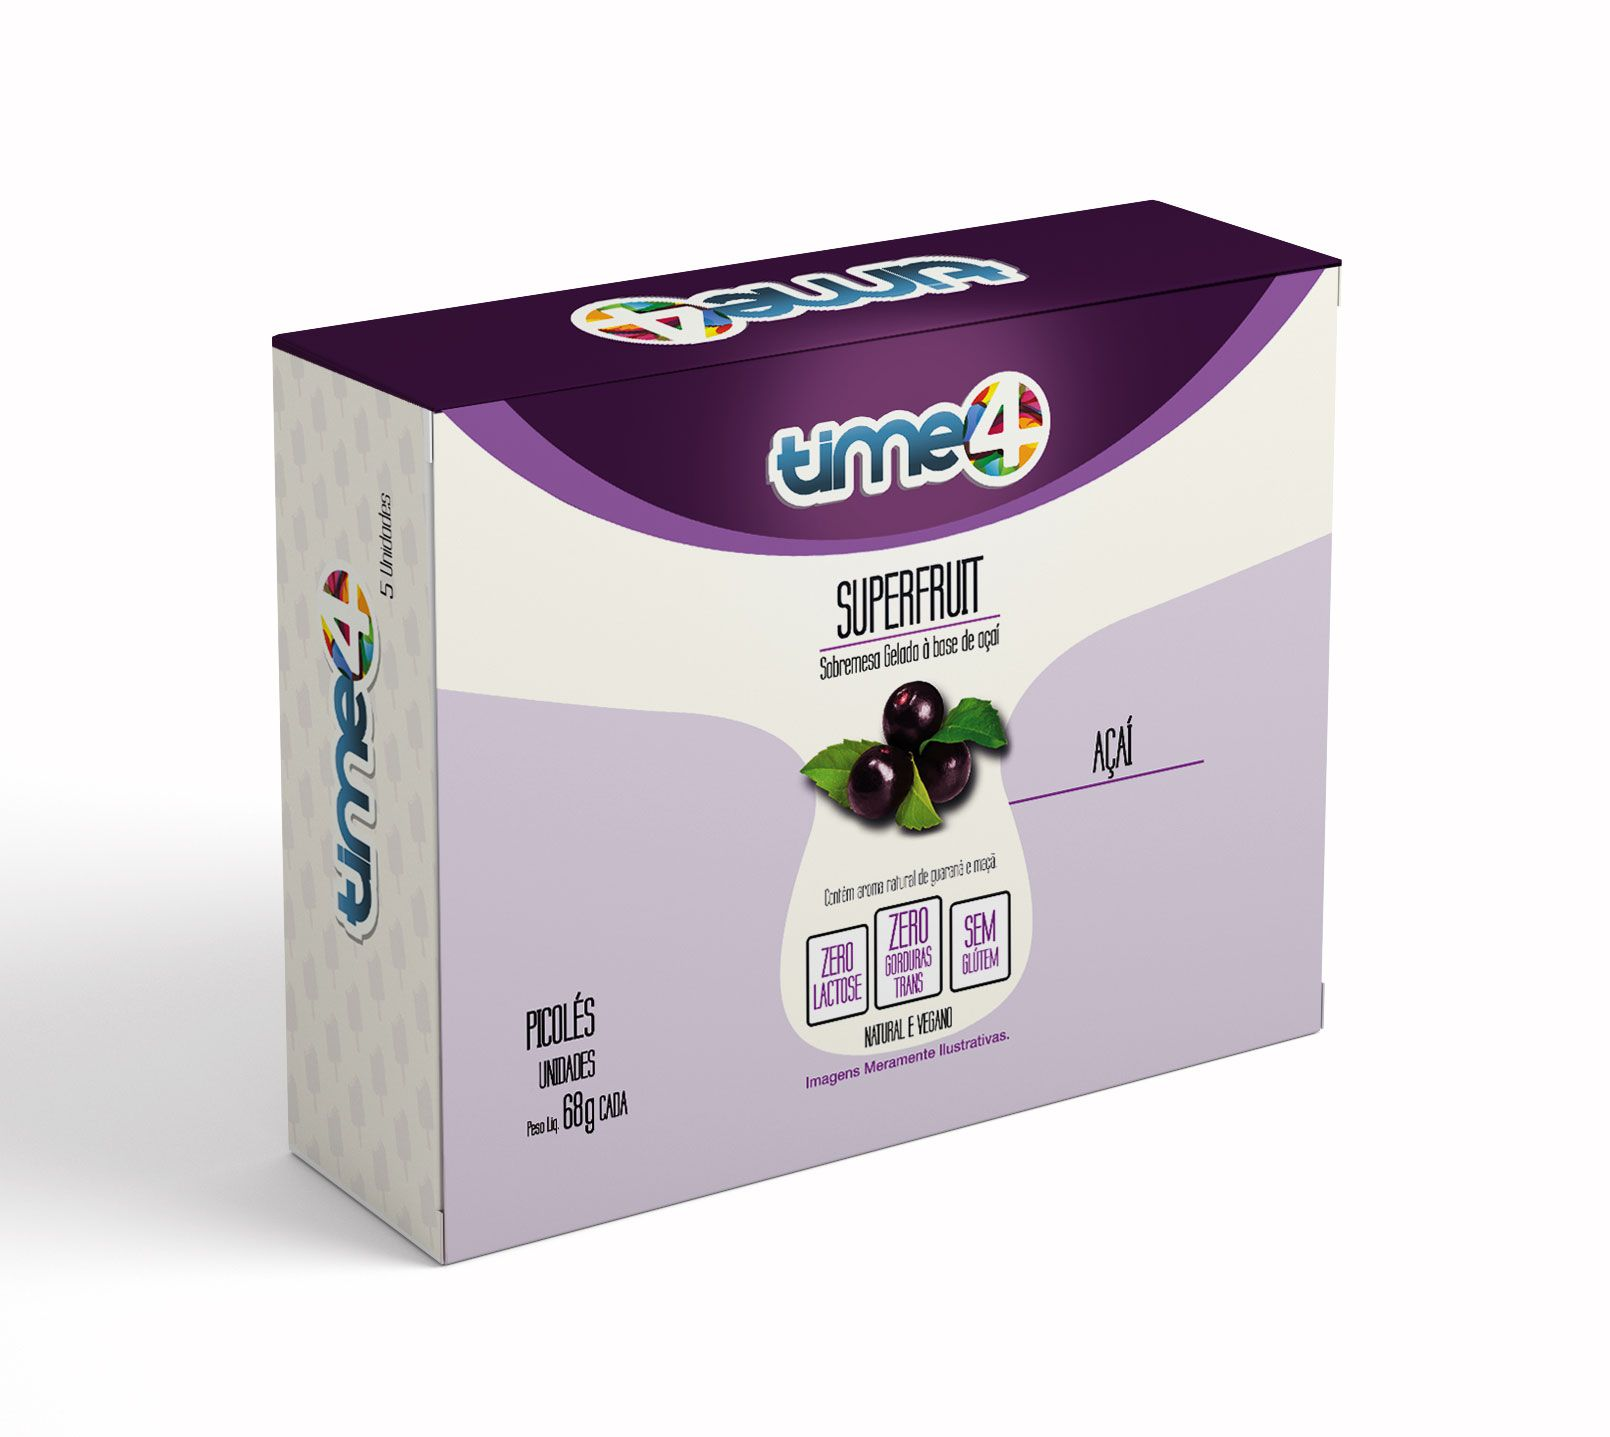 Picolé Supercolor Açaí 5 unidades